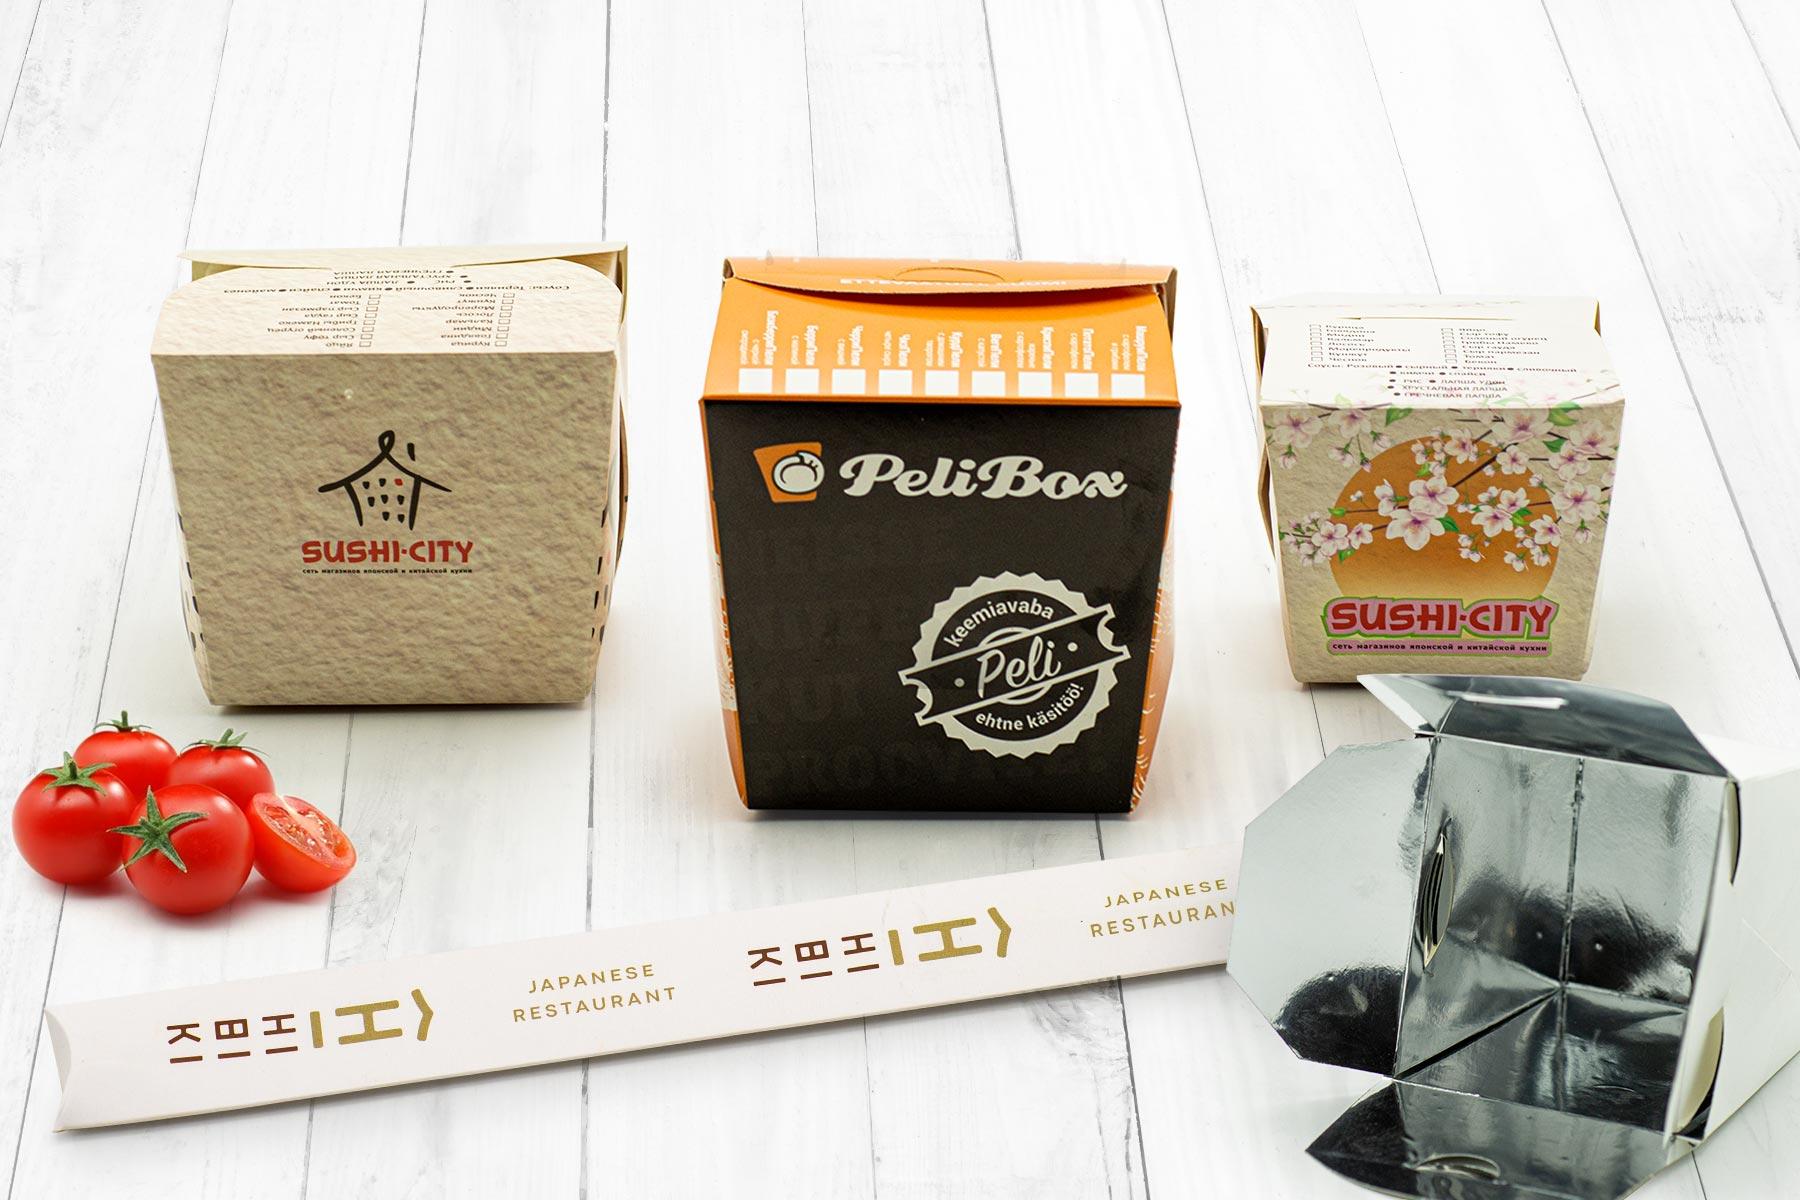 Фаст-фуд упаковка картон печать